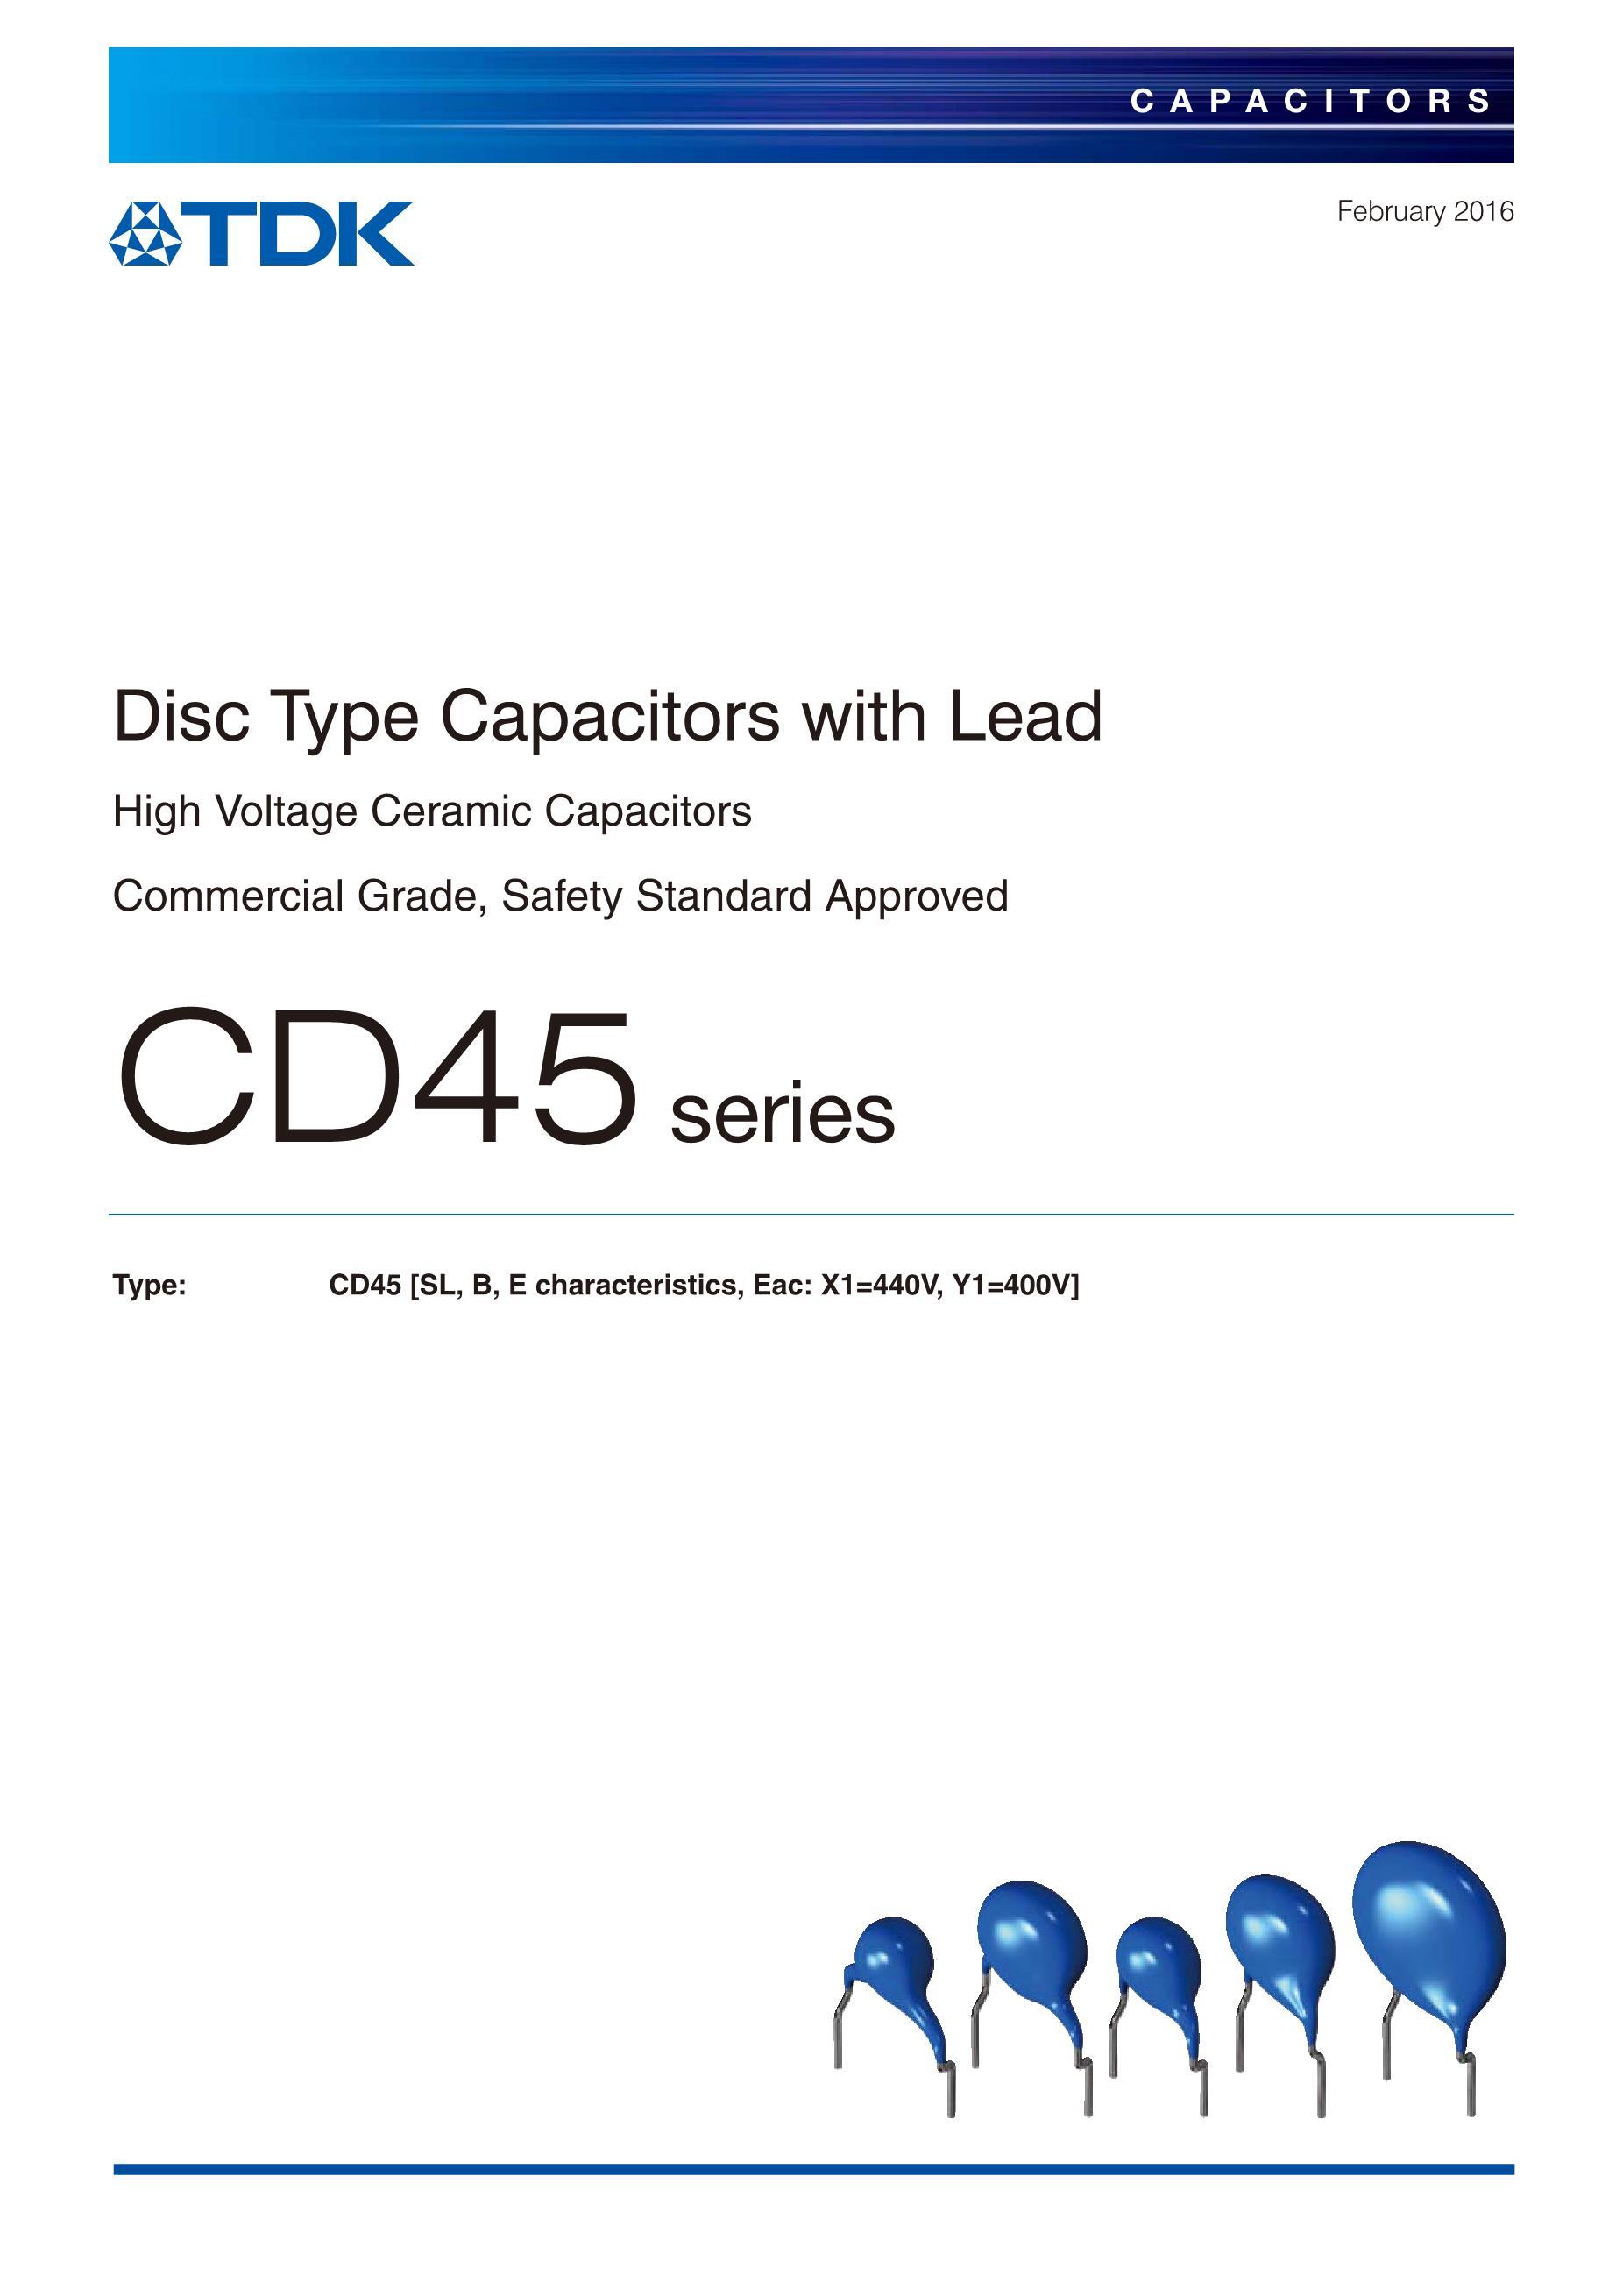 CD4528BMW/883QS's pdf picture 1